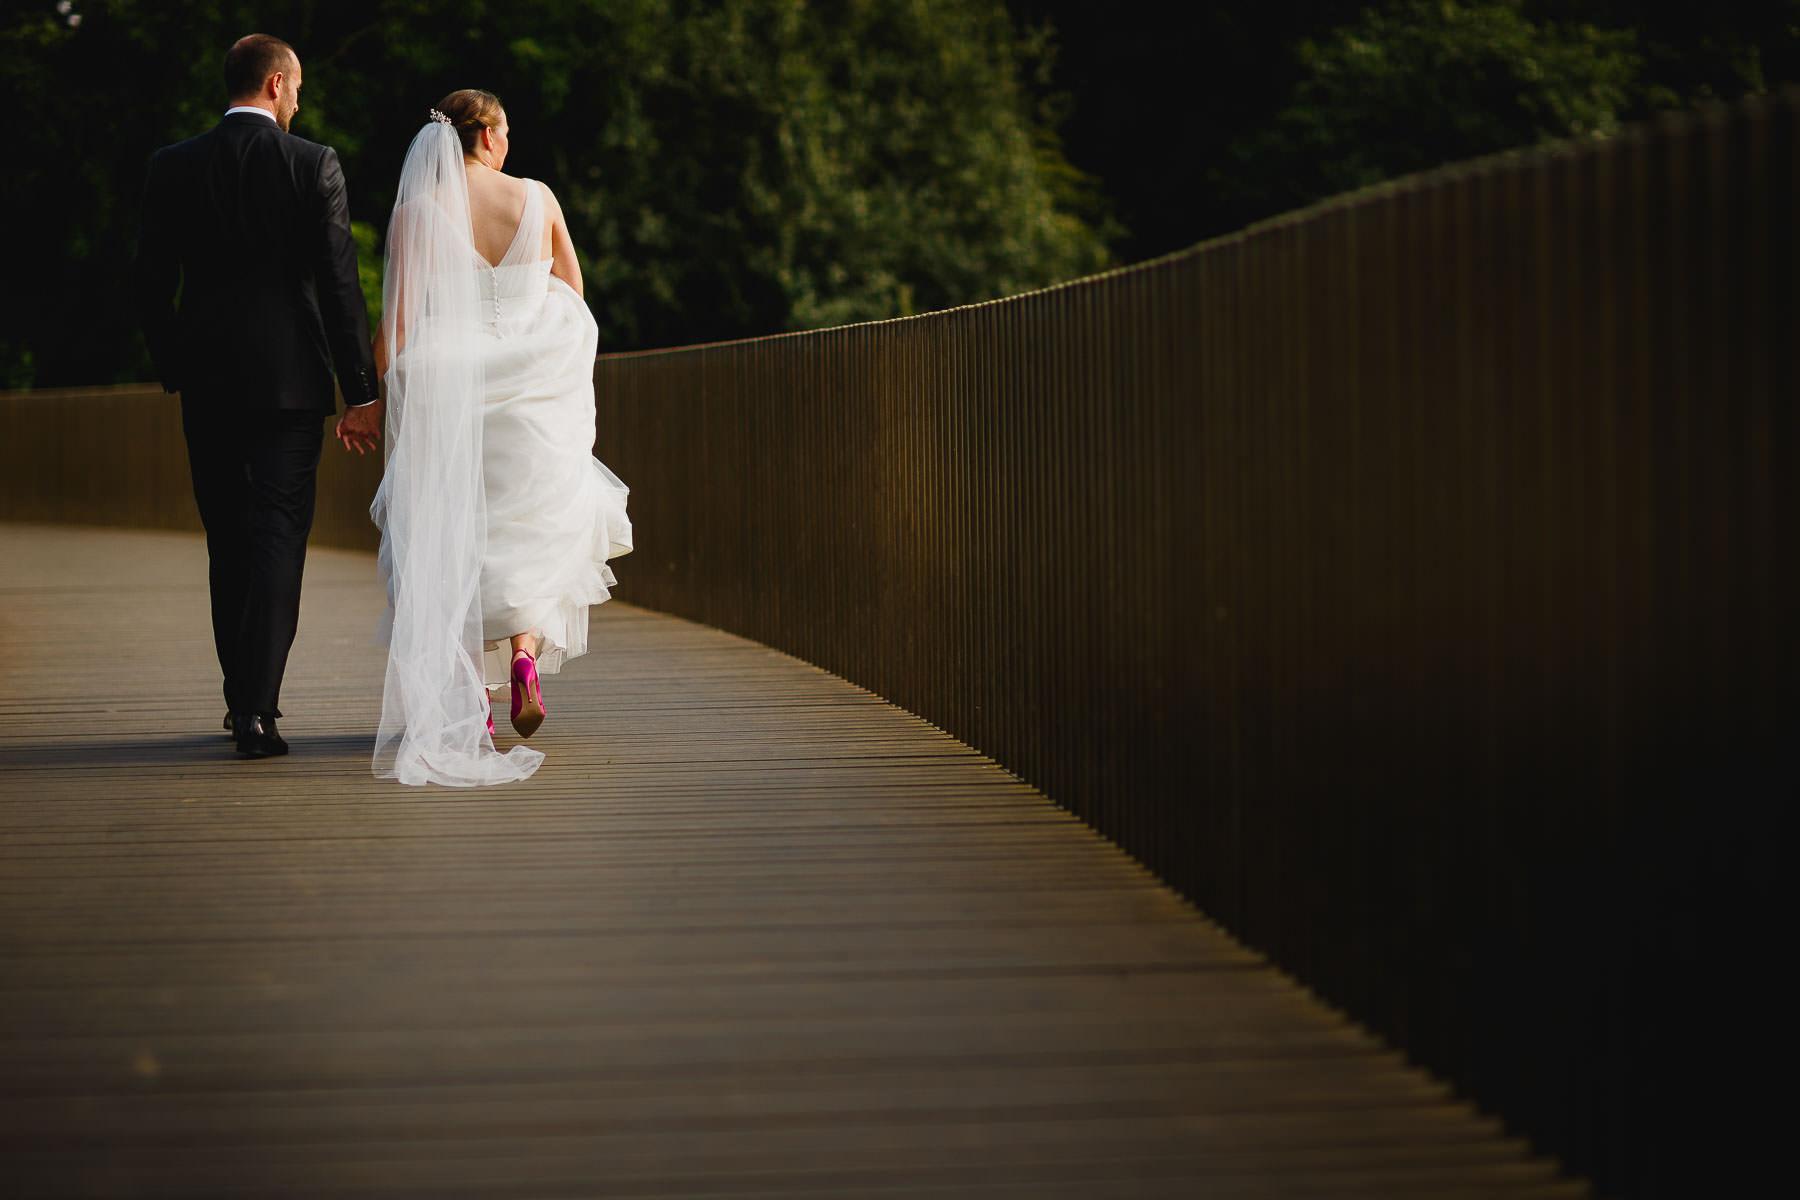 kew gardens wedding photography astra duncan48